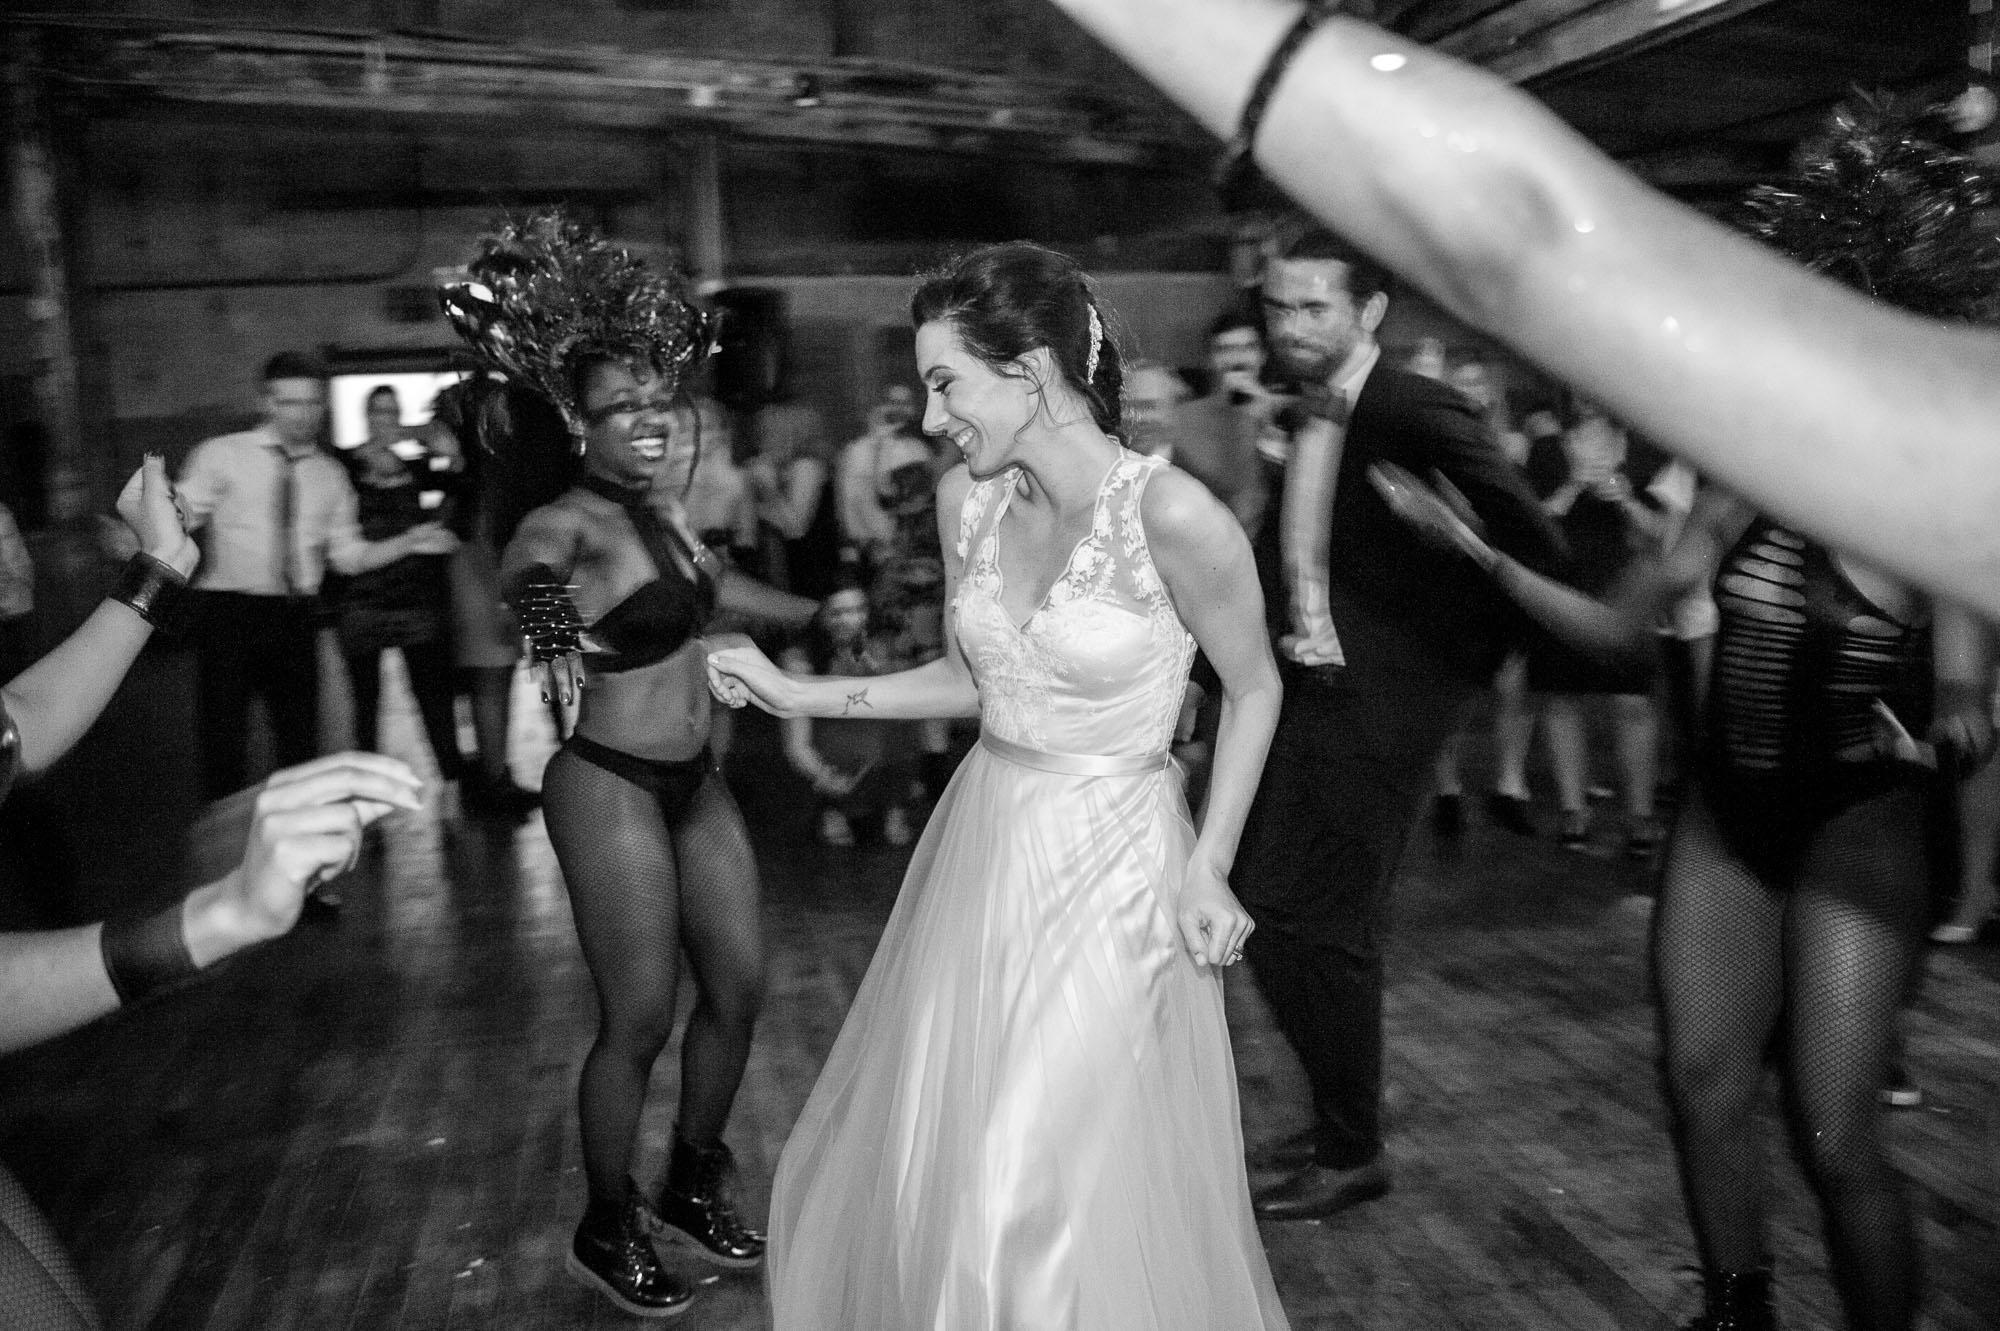 DSC_9406greenpoint-lofts-brooklyn-wedding-066.jpg